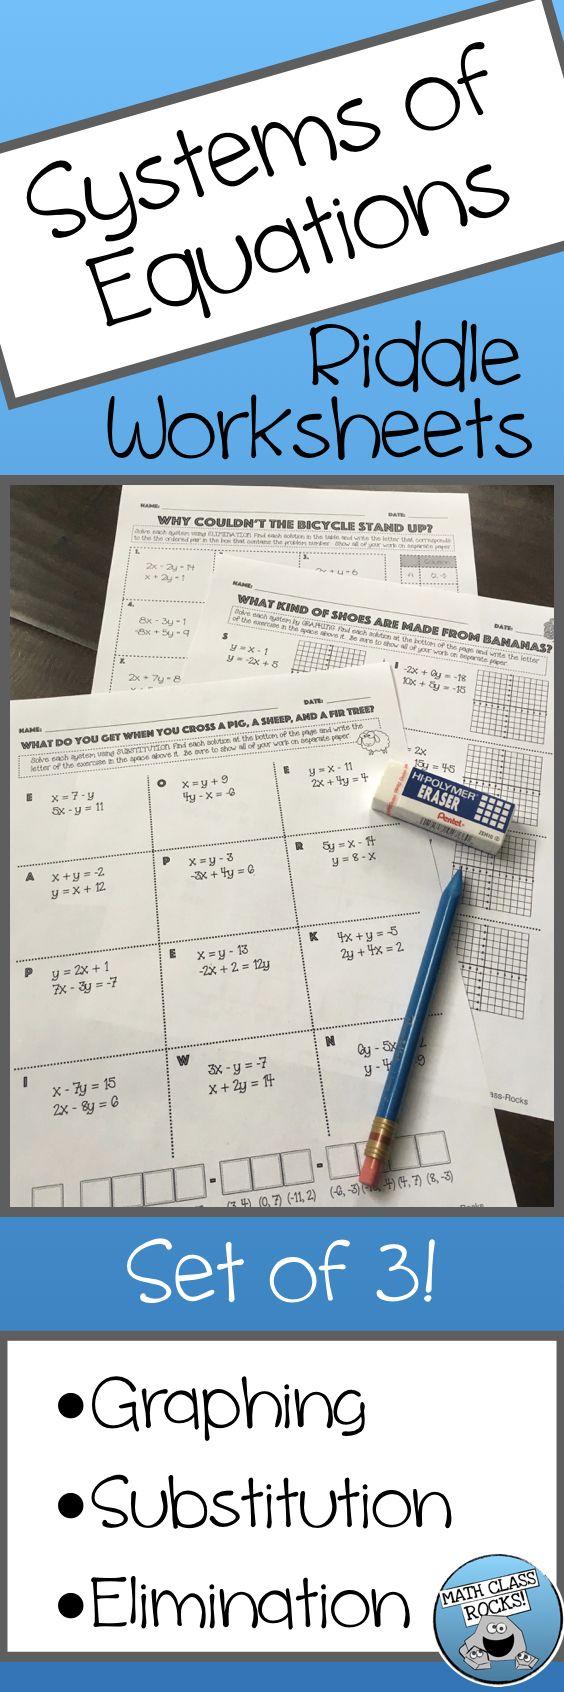 Solve systems riddle worksheets set of 3 Math riddles